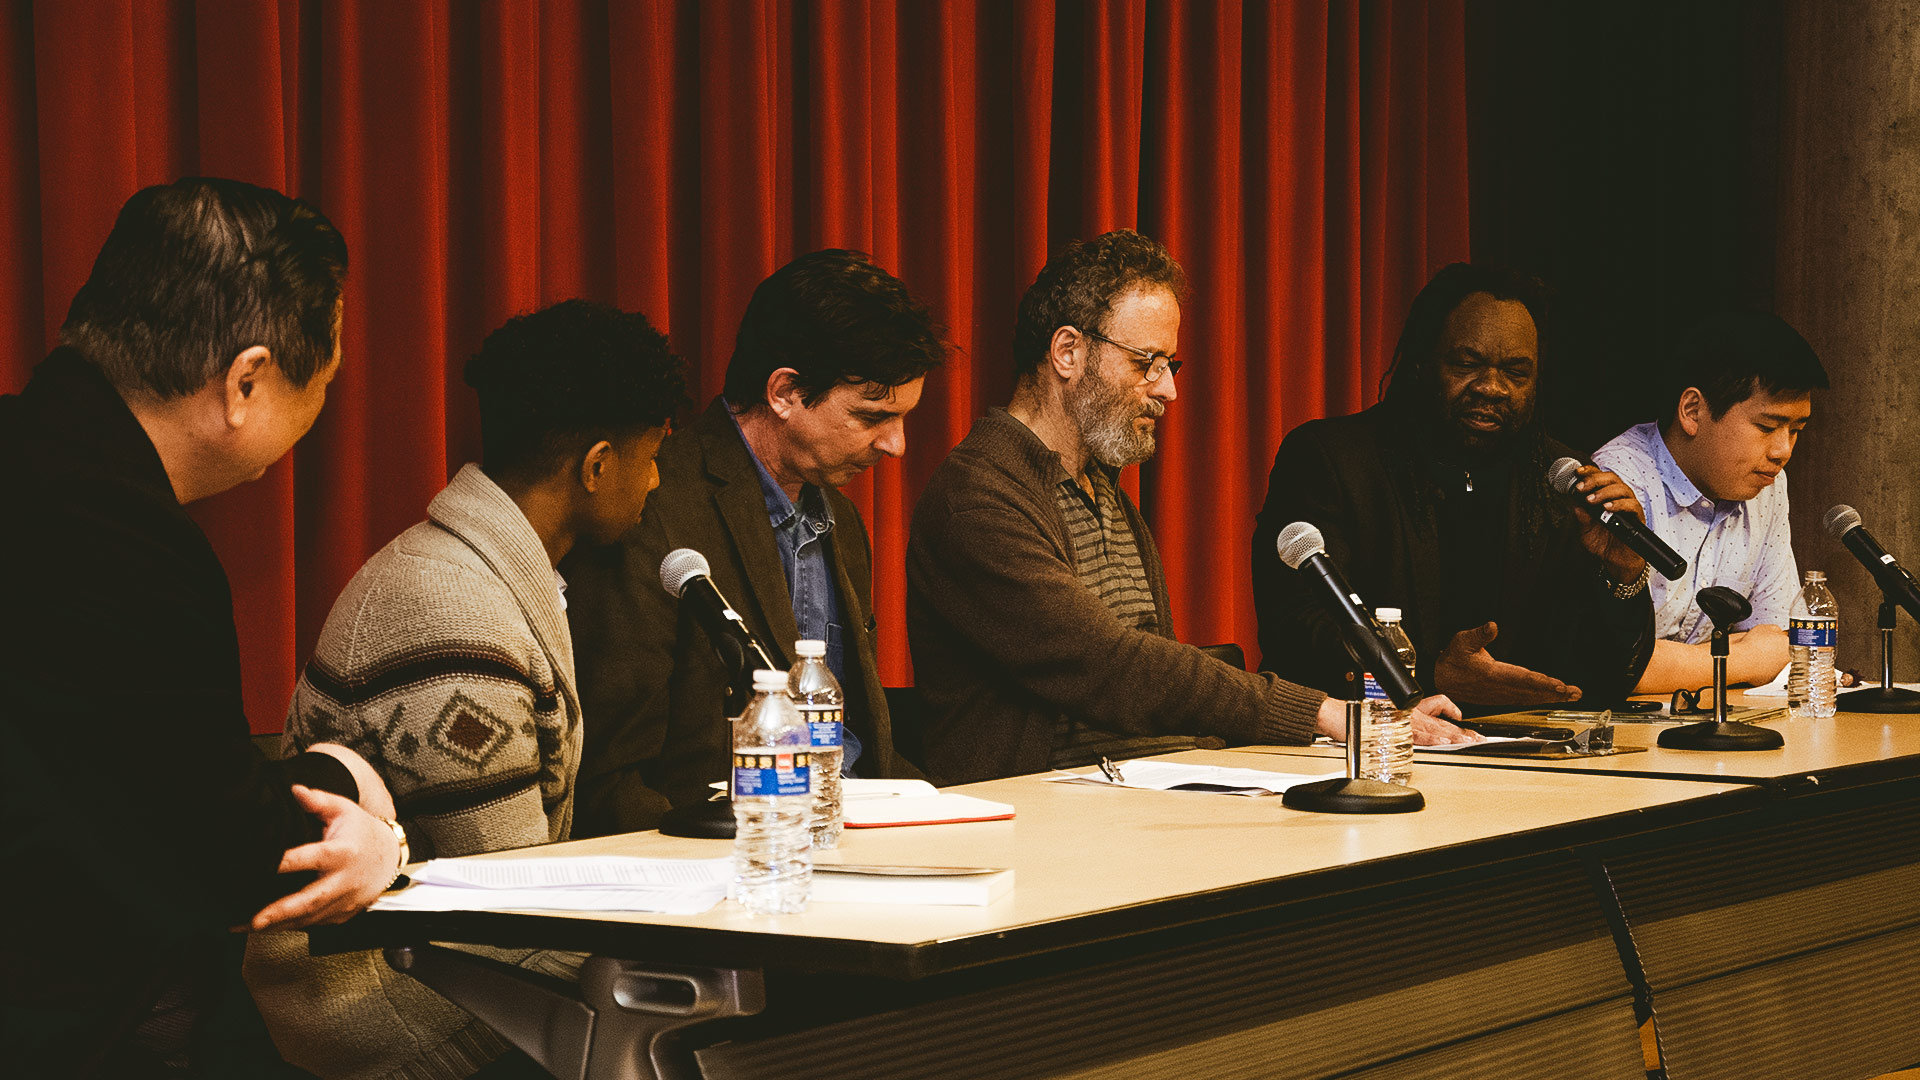 Panel of men speaking